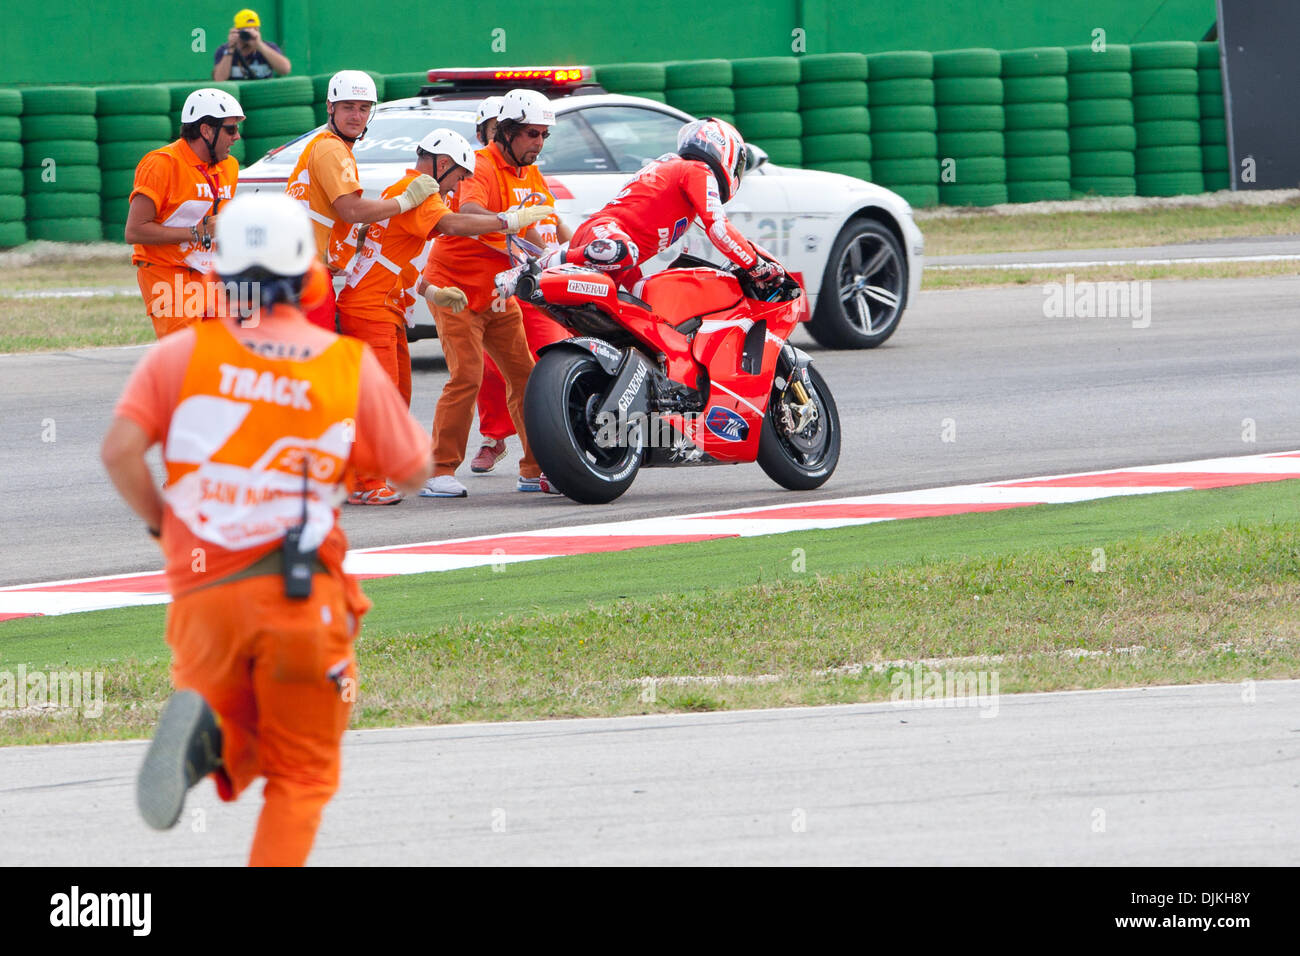 Sep. 07, 2010 - Misano Adriatico, Italy - Ducati  rider Nicky Hayden (USA #69) after a crash during the San Marino GP in Misano Adriatico, Italy. (Credit Image: © Andrea Ranalli/Southcreek Global/ZUMApress.com) - Stock Image